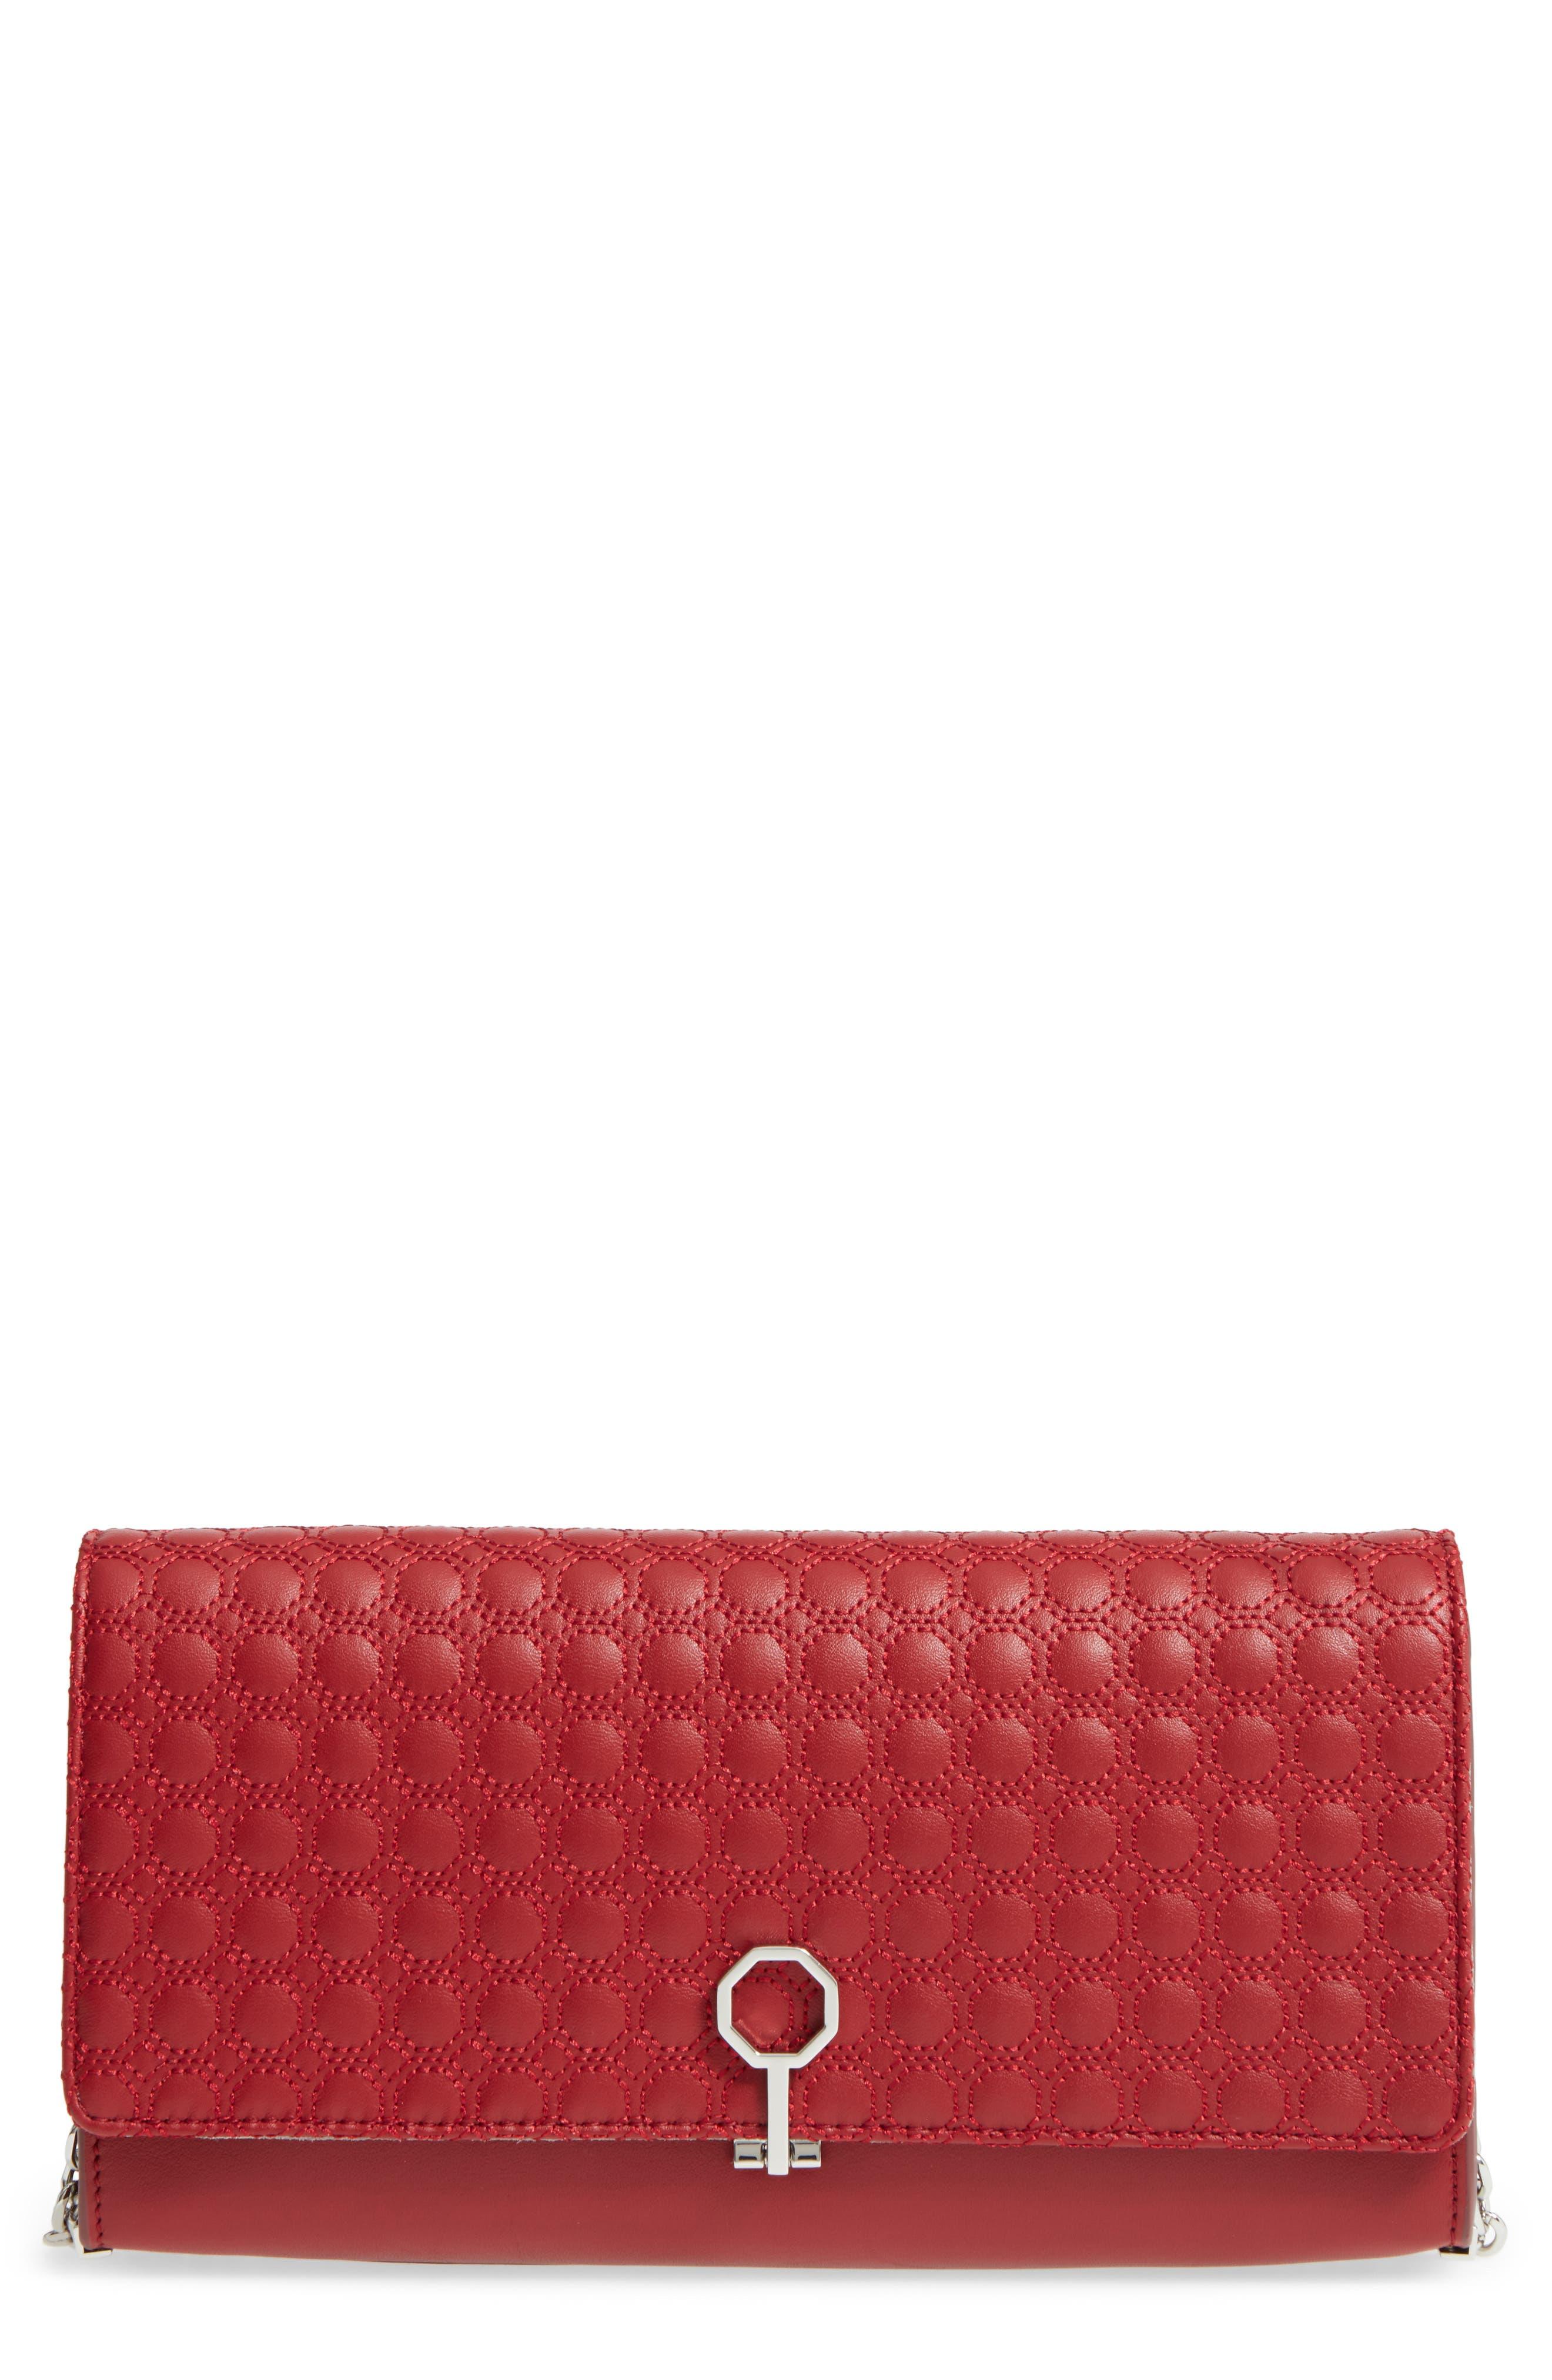 'Yvet' Leather Flap Clutch,                             Main thumbnail 1, color,